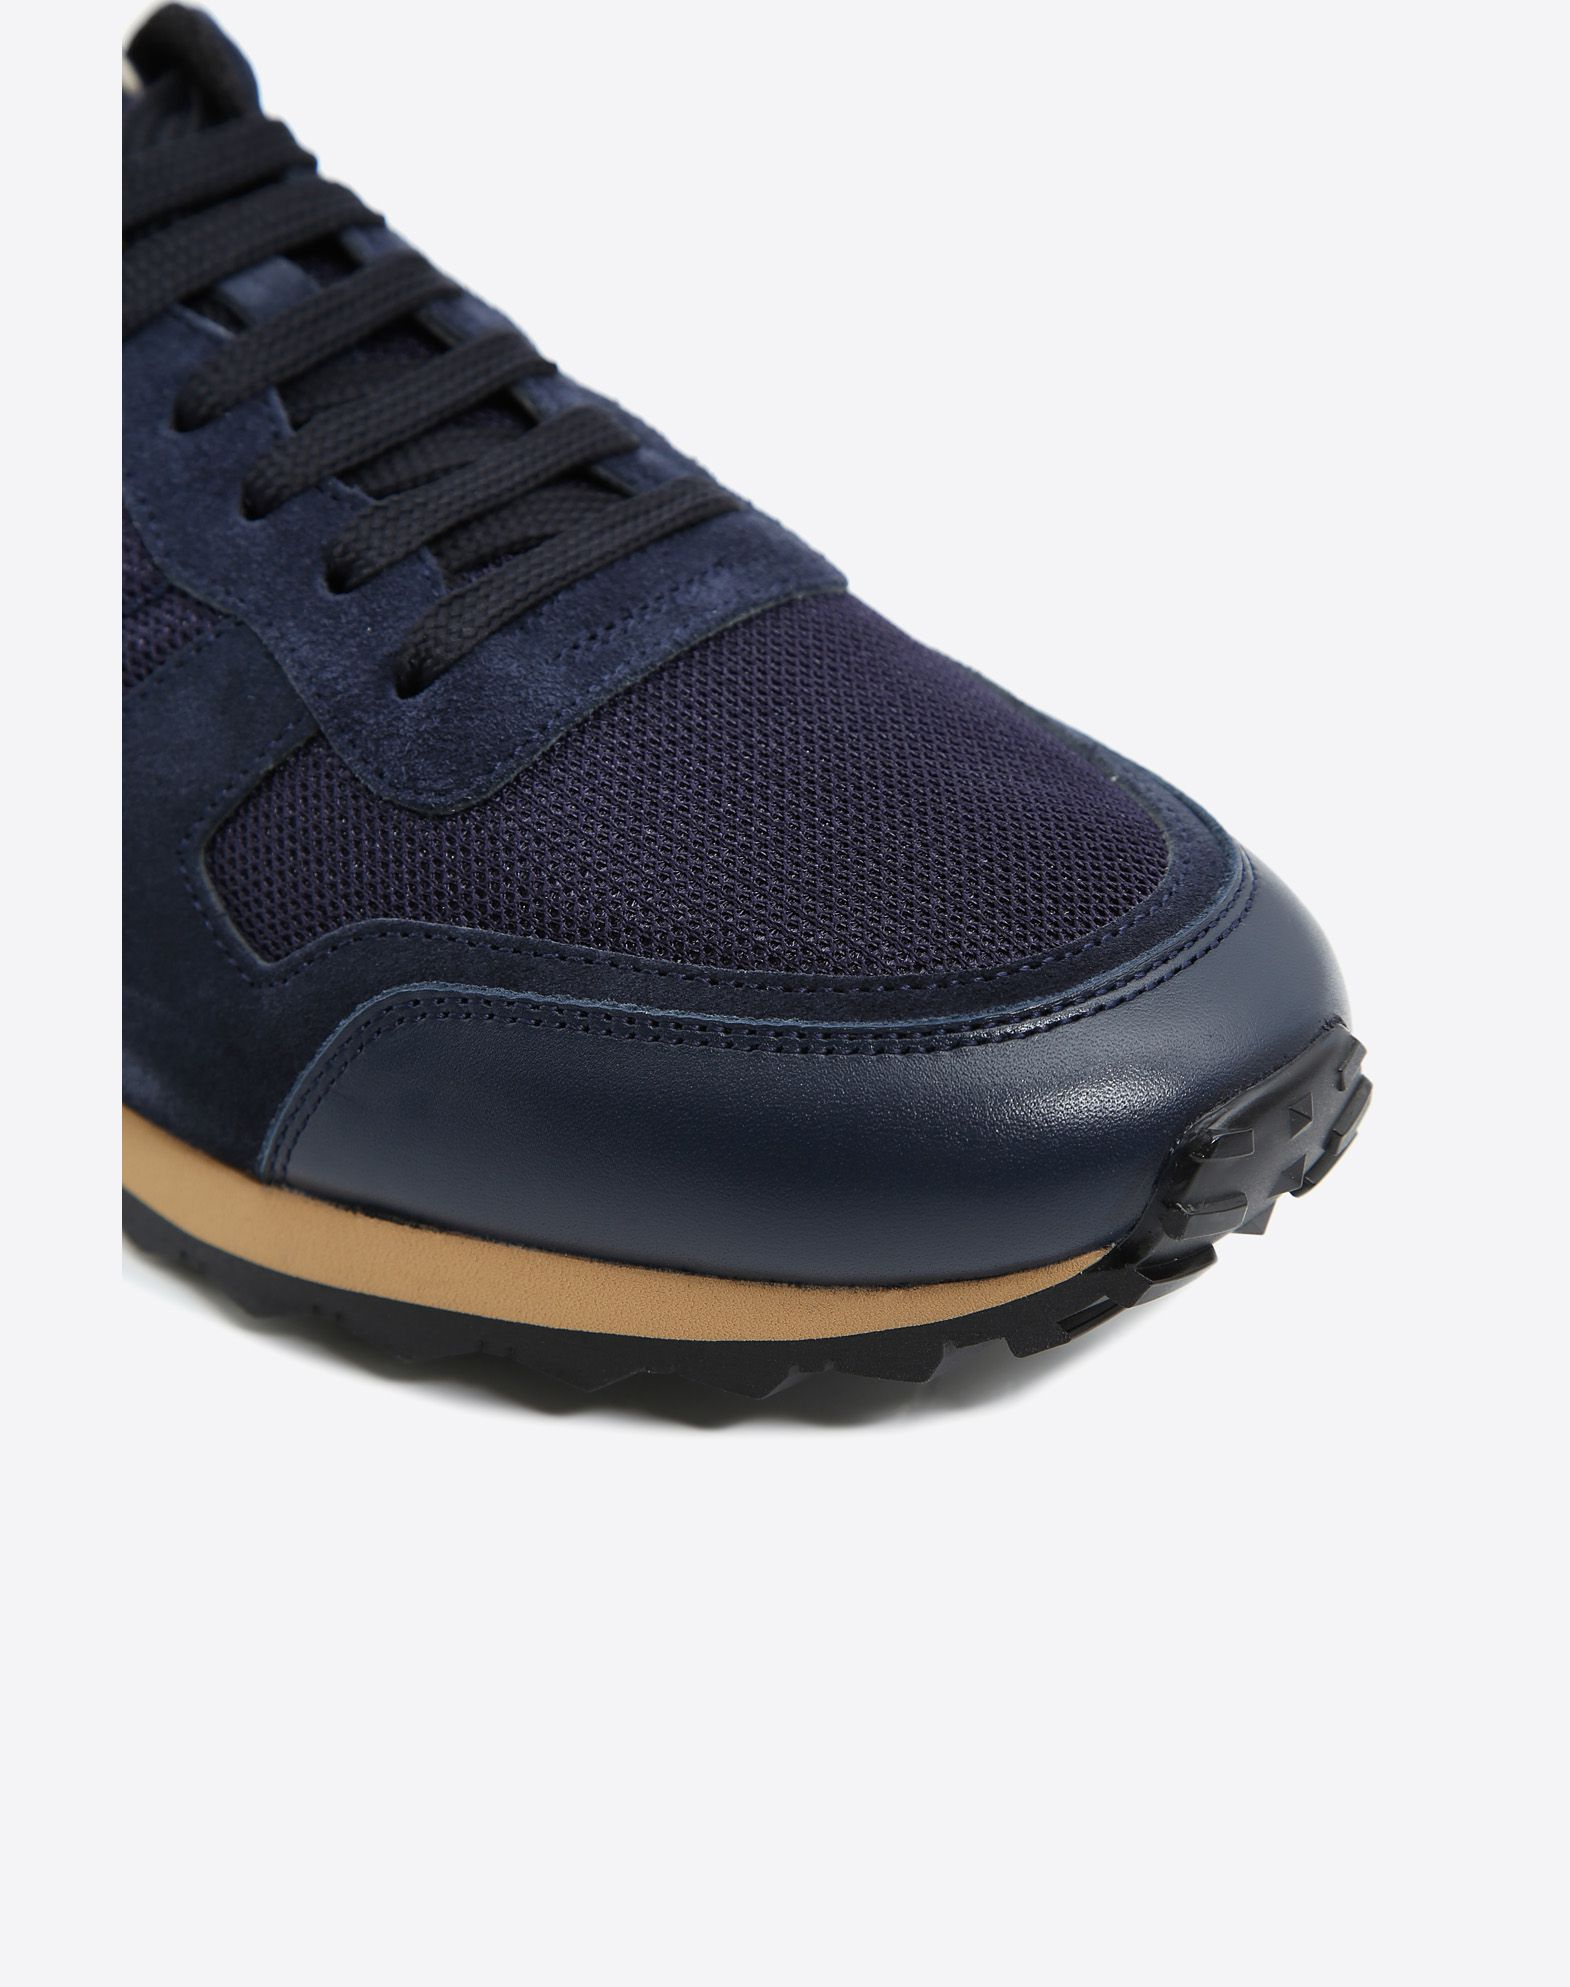 VALENTINO GARAVANI UOMO MY2S0723TCV H07 Sneaker U b